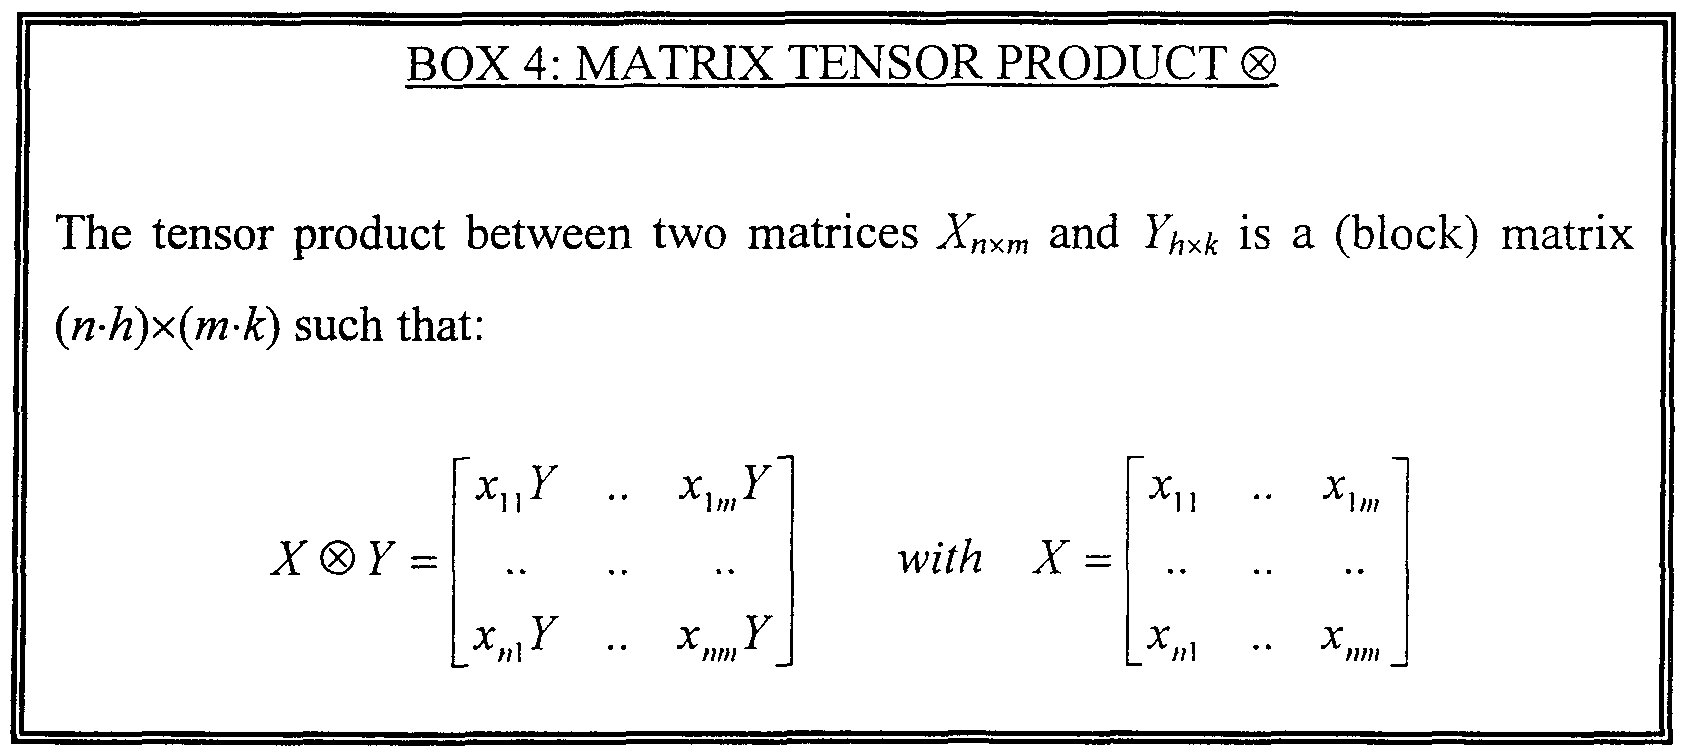 Figure imgf000018_0001 example matrix tensor product